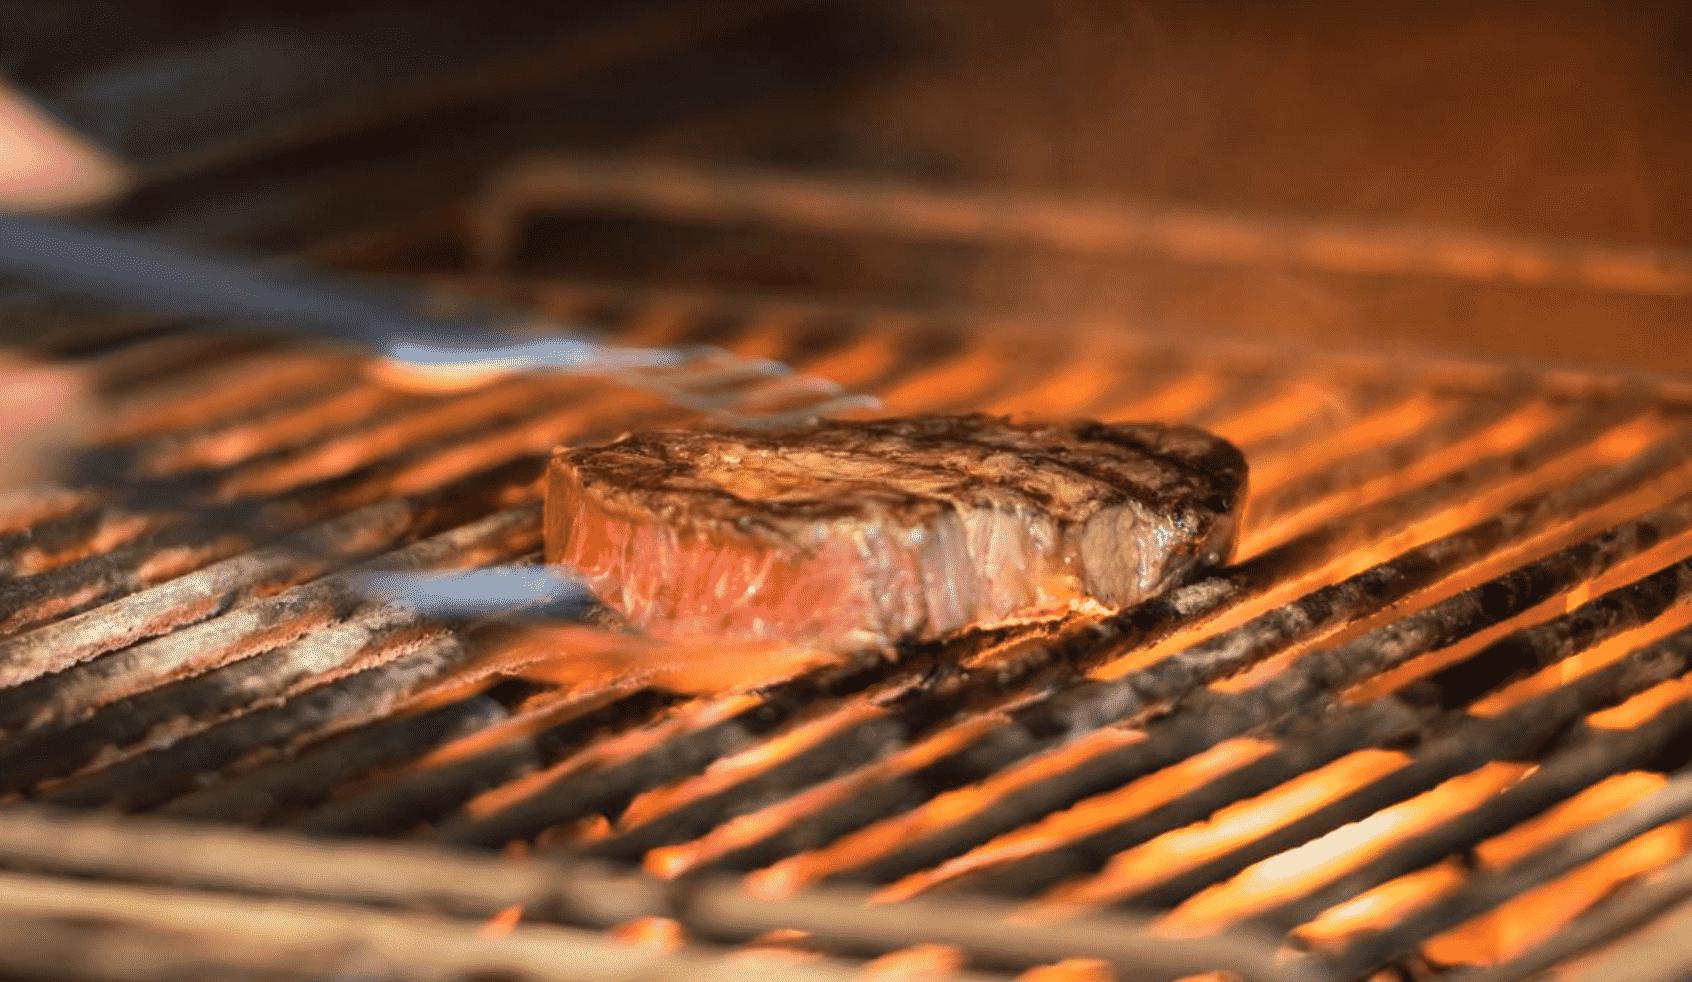 Steak In Norway